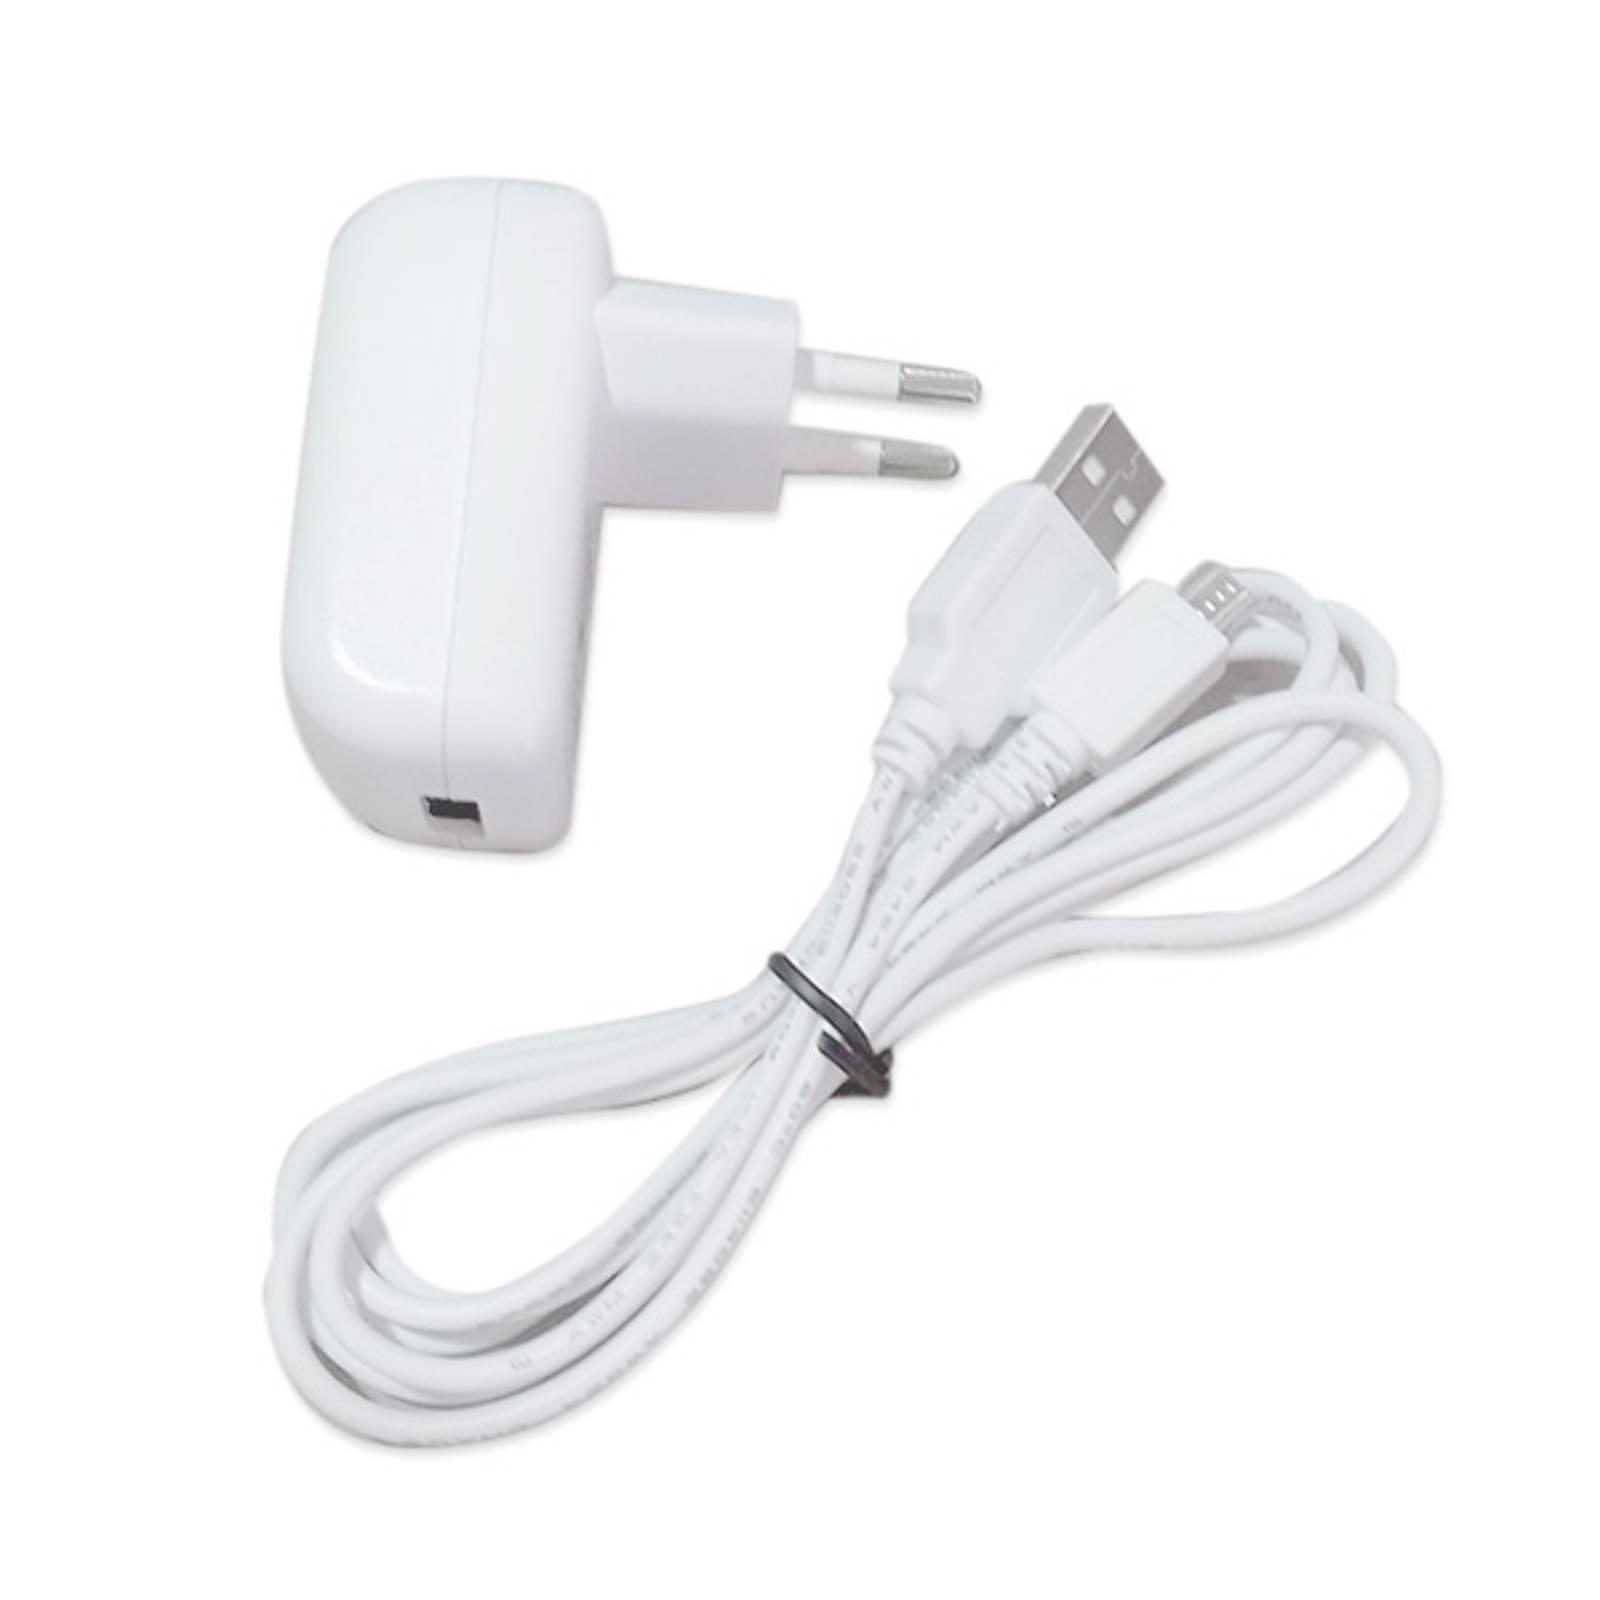 1 caricatore USB per lampada LED esterni Patio